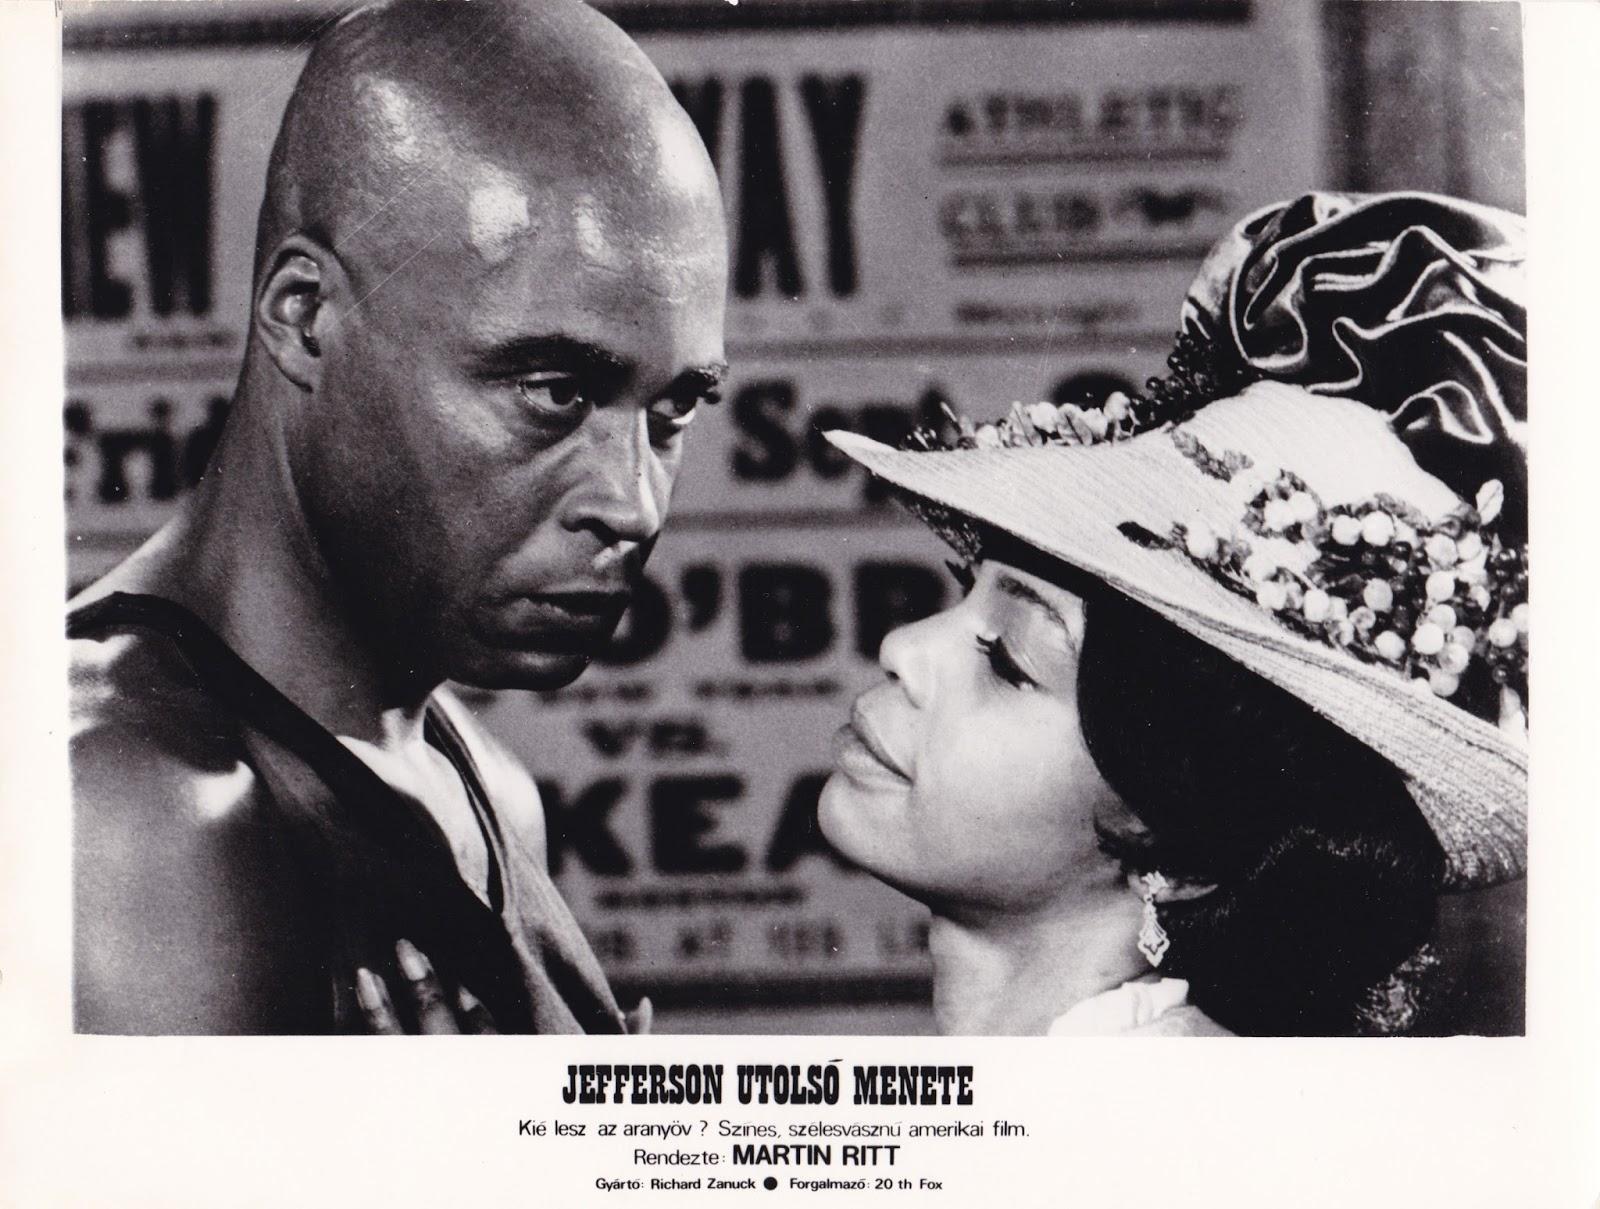 James Earl Jones and Marlene Warfield in The Great White Hope (1970)